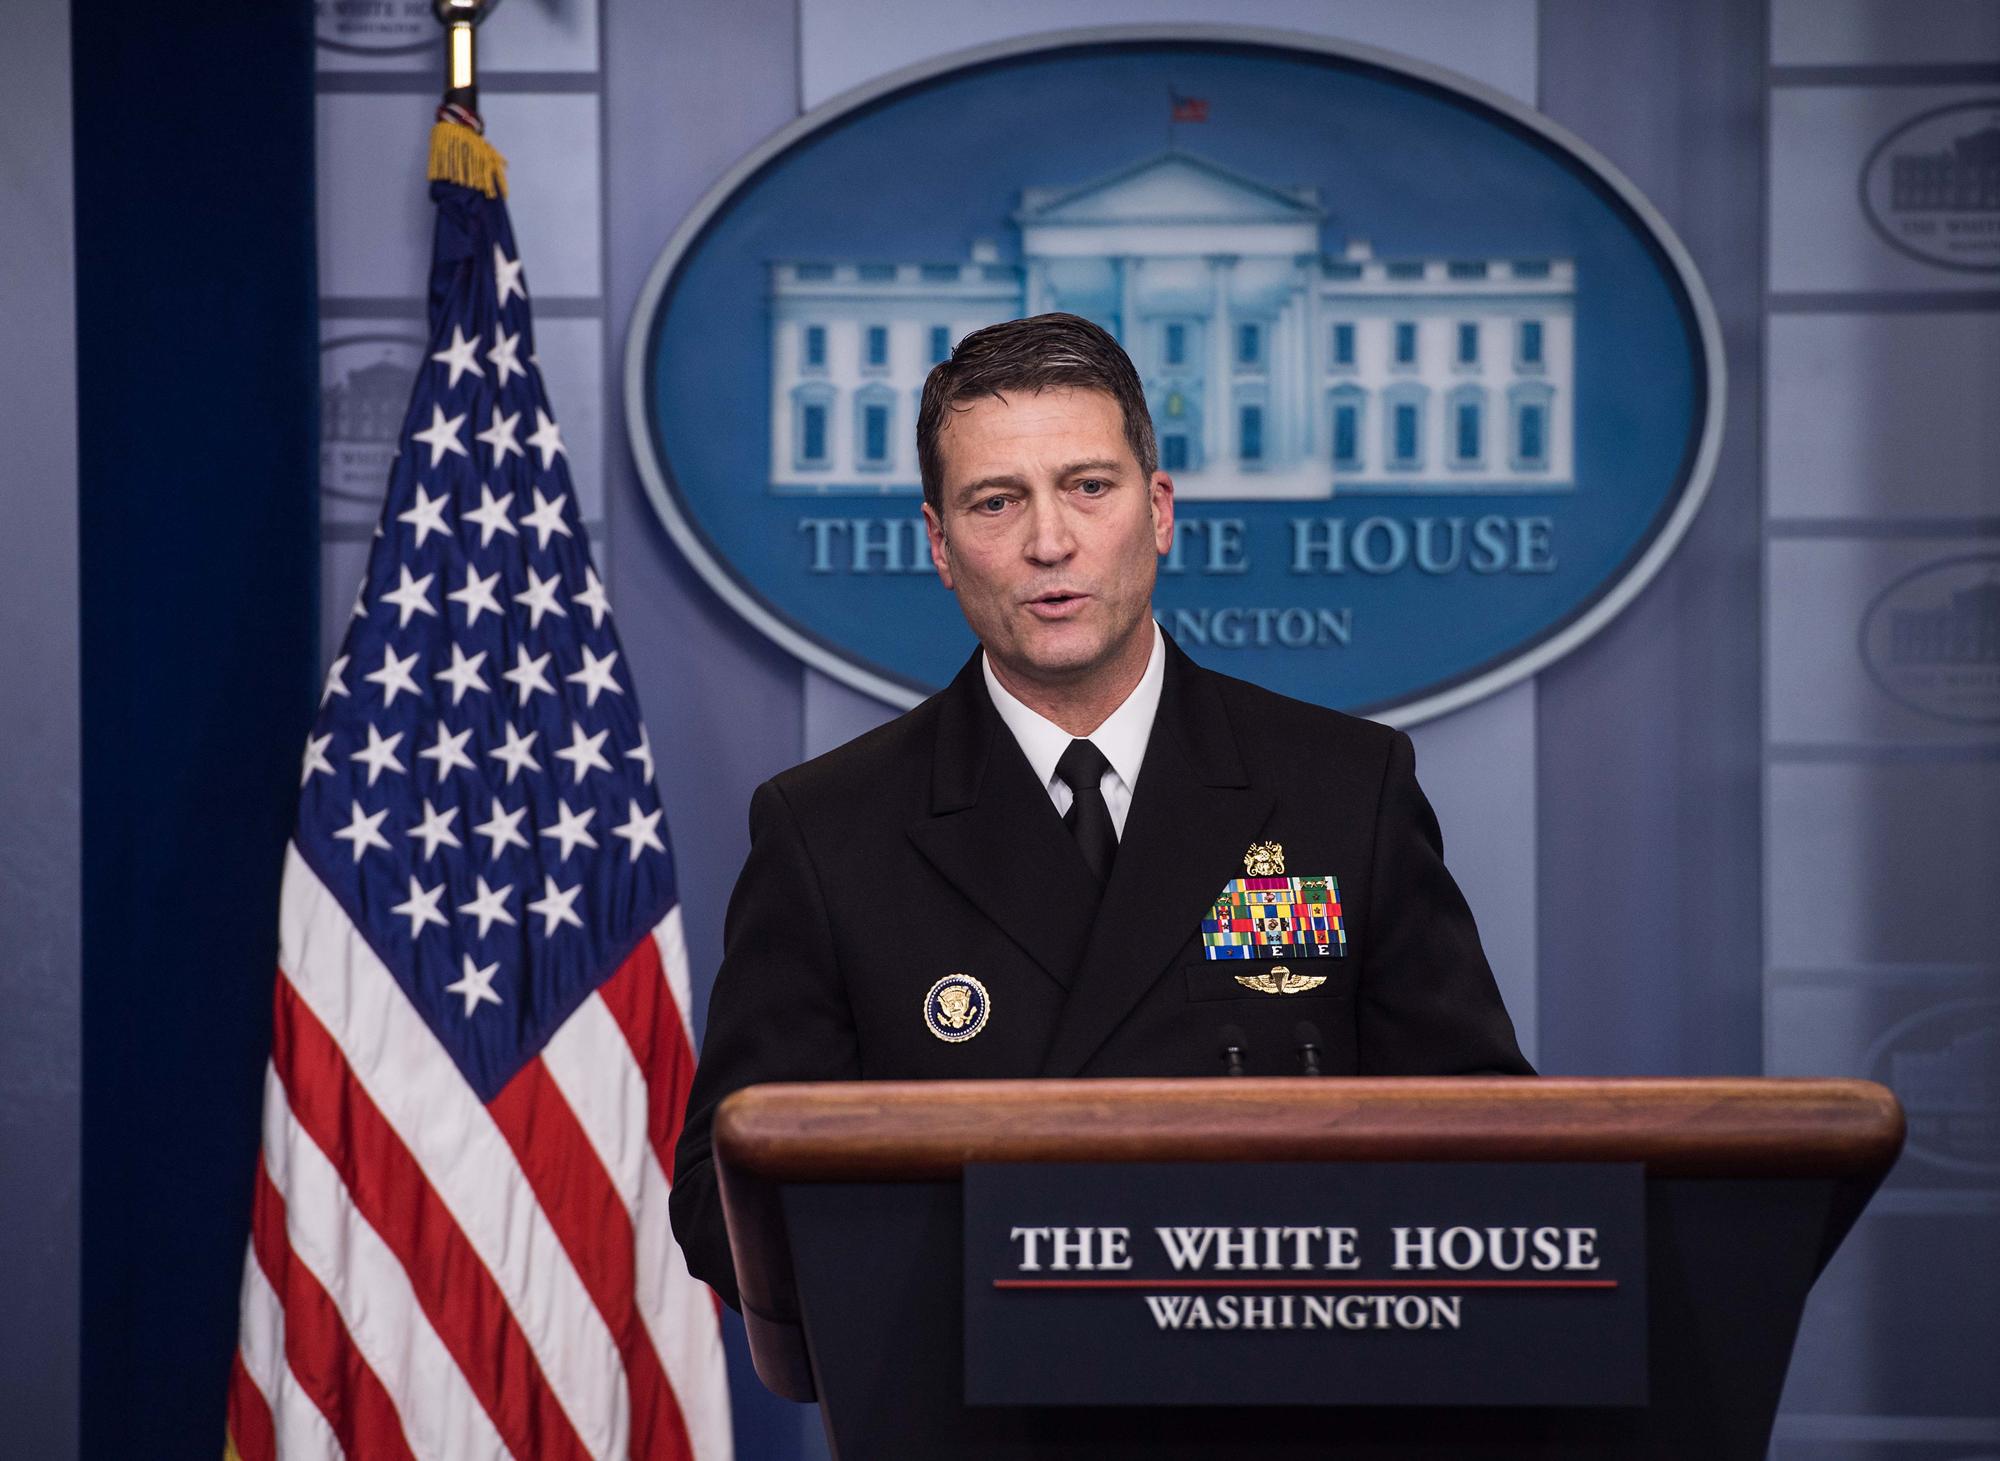 Jackson BREAKING: Trump fires anti pot Veterans Affairs chief David Shulkin